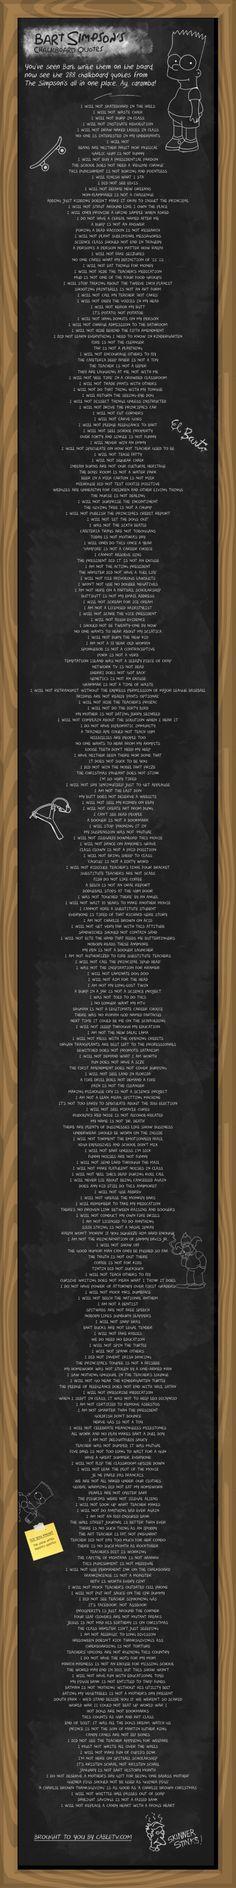 Todas as frases de Bart! All Bart Simpson chalkboard sentences